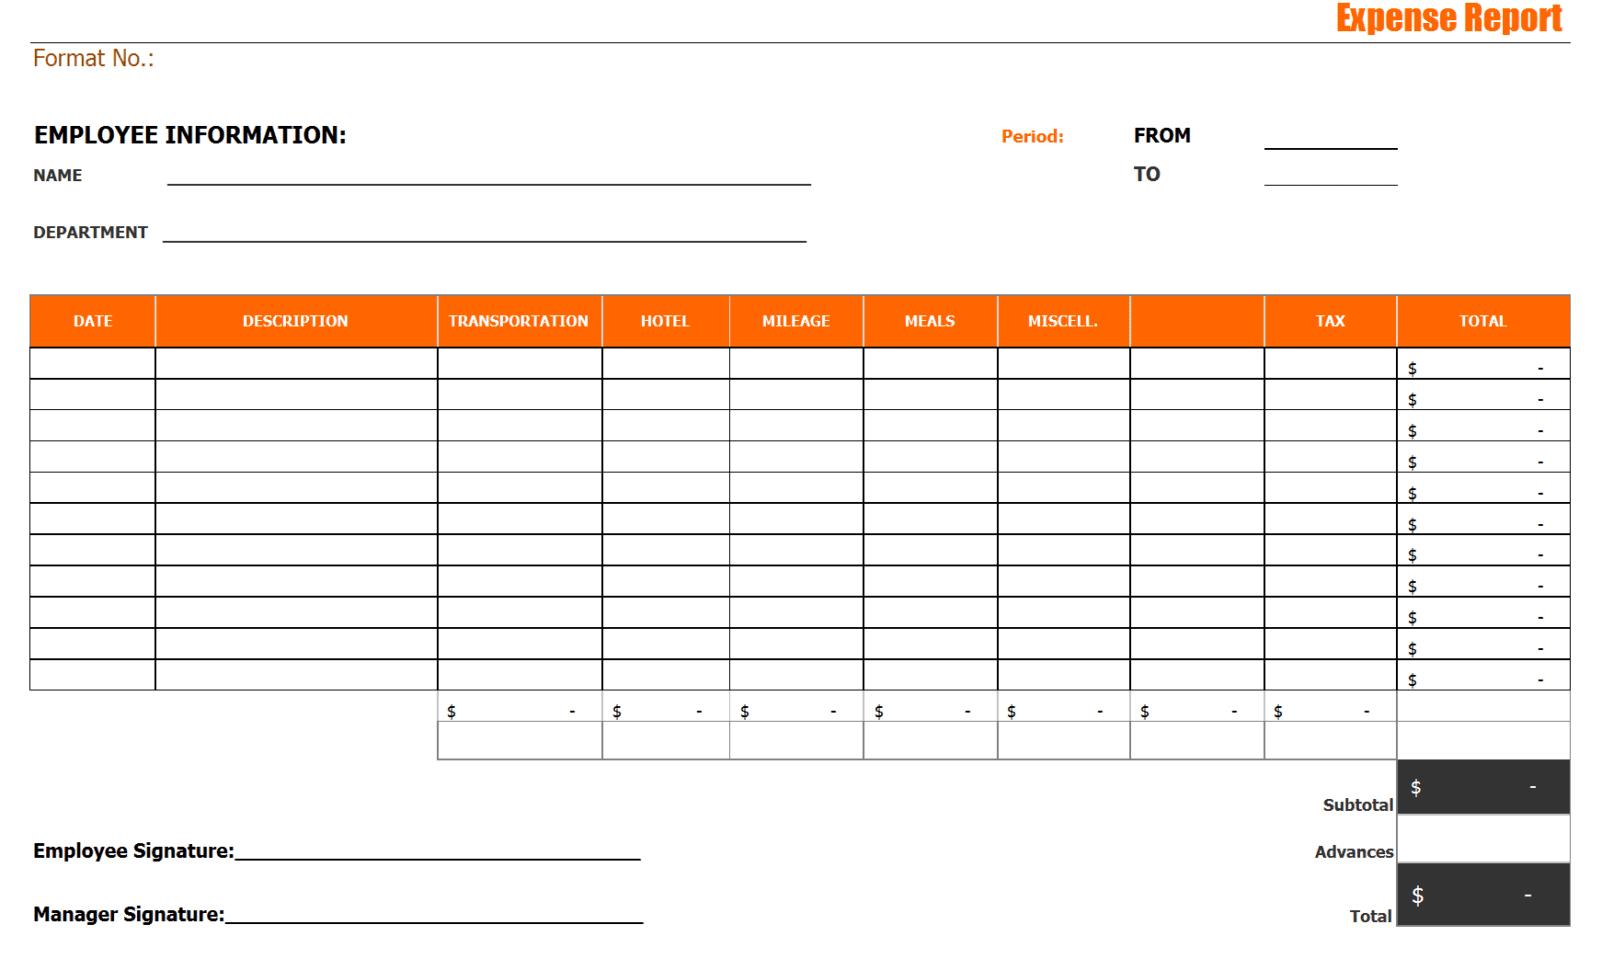 company expense report spreadsheet templates for busines travel expense report template monthly. Black Bedroom Furniture Sets. Home Design Ideas